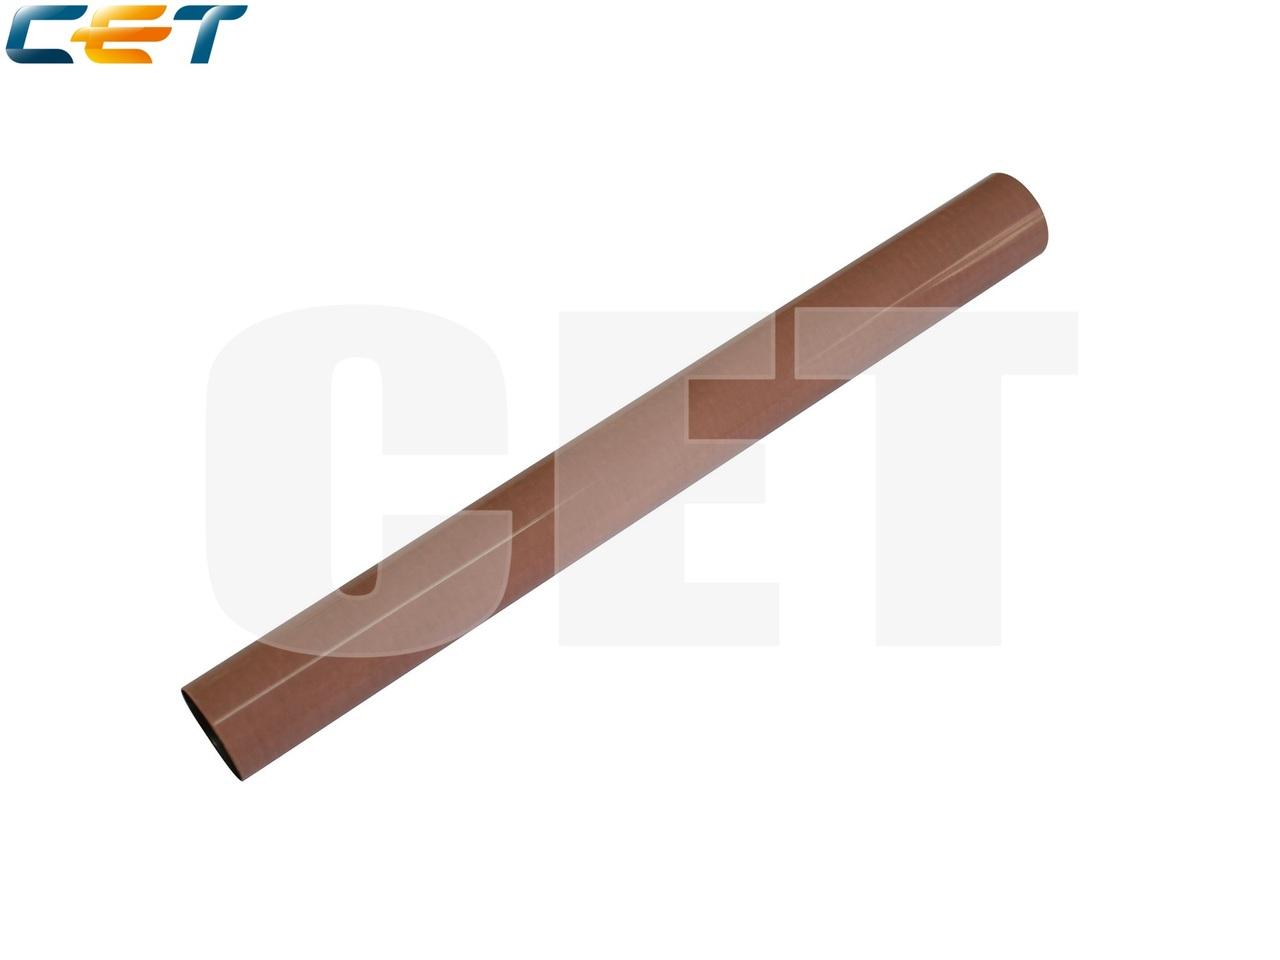 Термопленка для HP Color LaserJet 4700/4730/CP3525,M551/M651/M680/M570/M575 (CET), CET1559